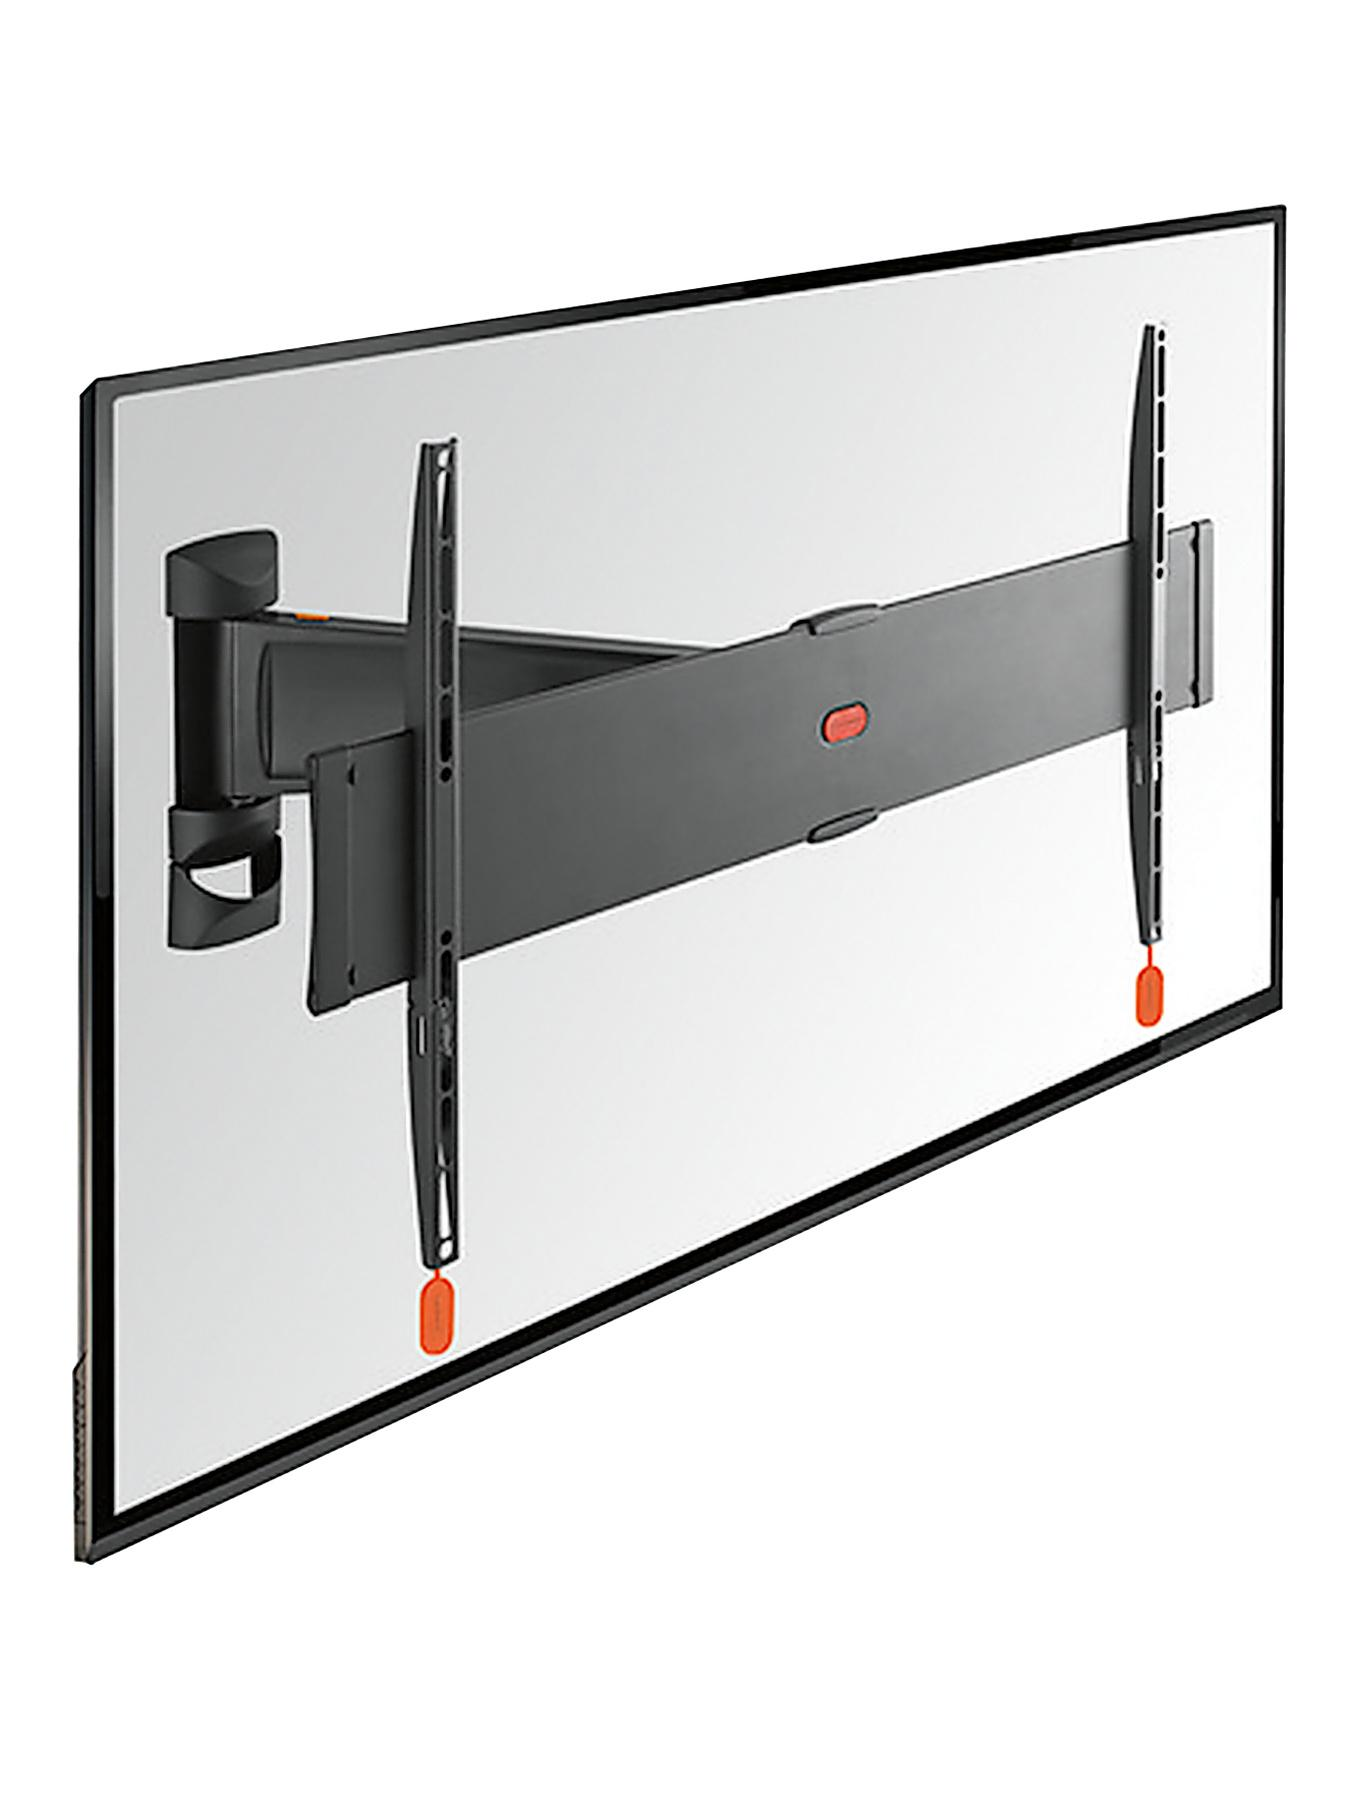 Turn Display Wallmount  1937 inch